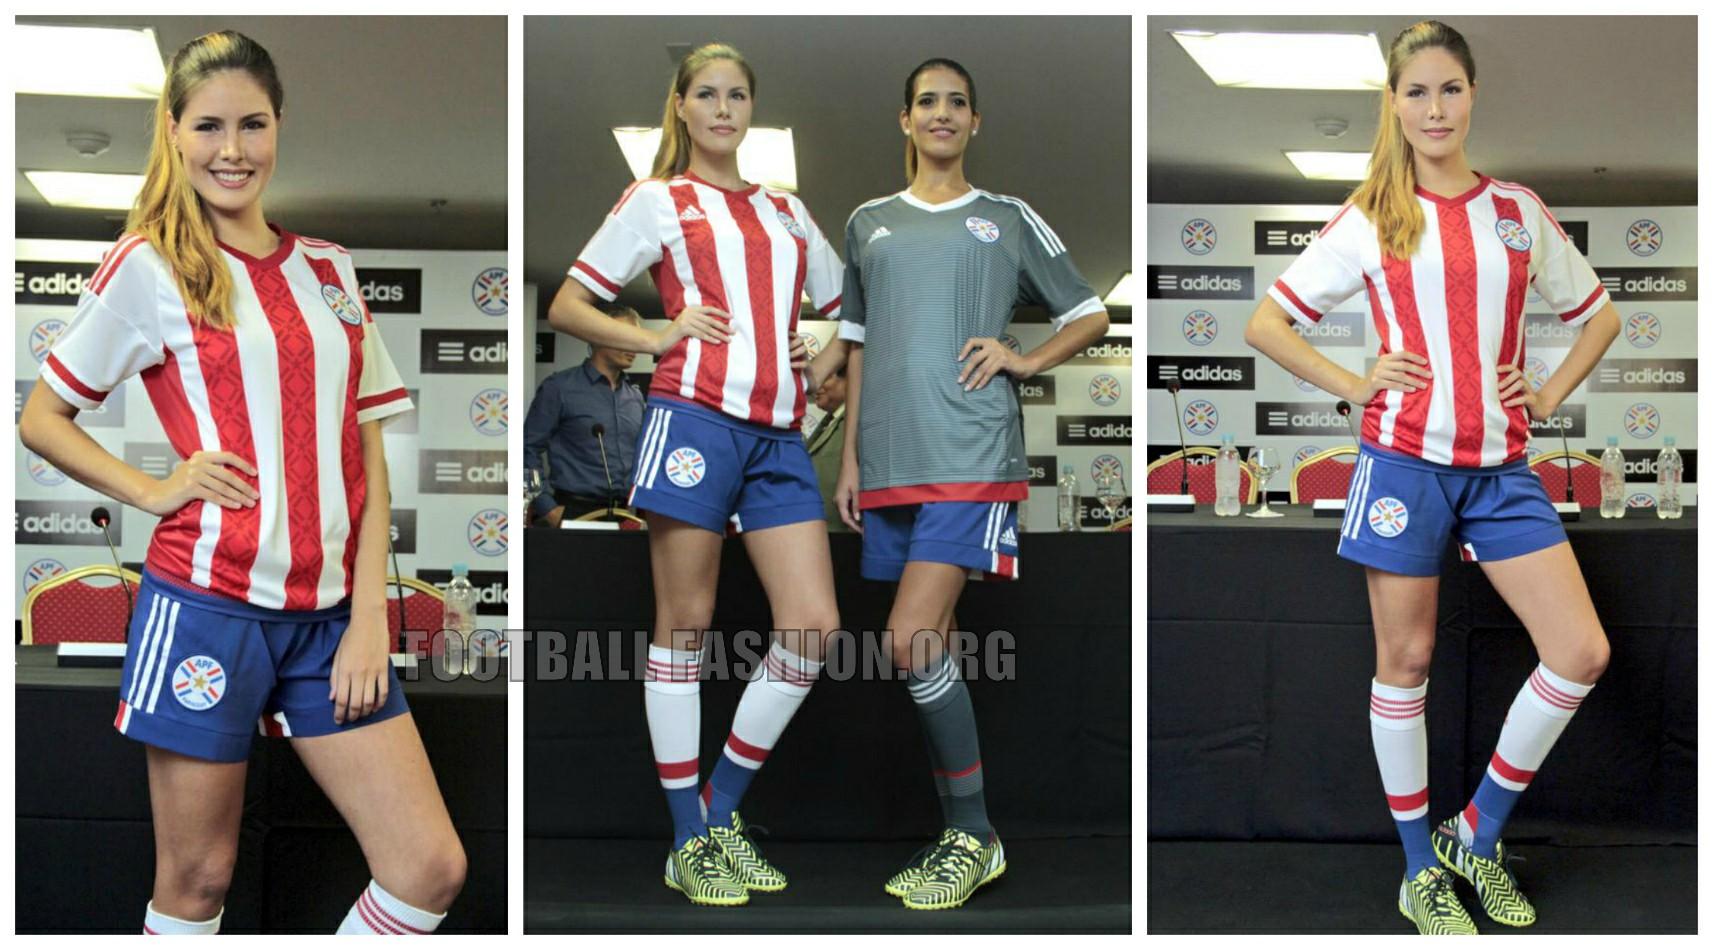 paraguay-2015-2016-adida-copa-america-je